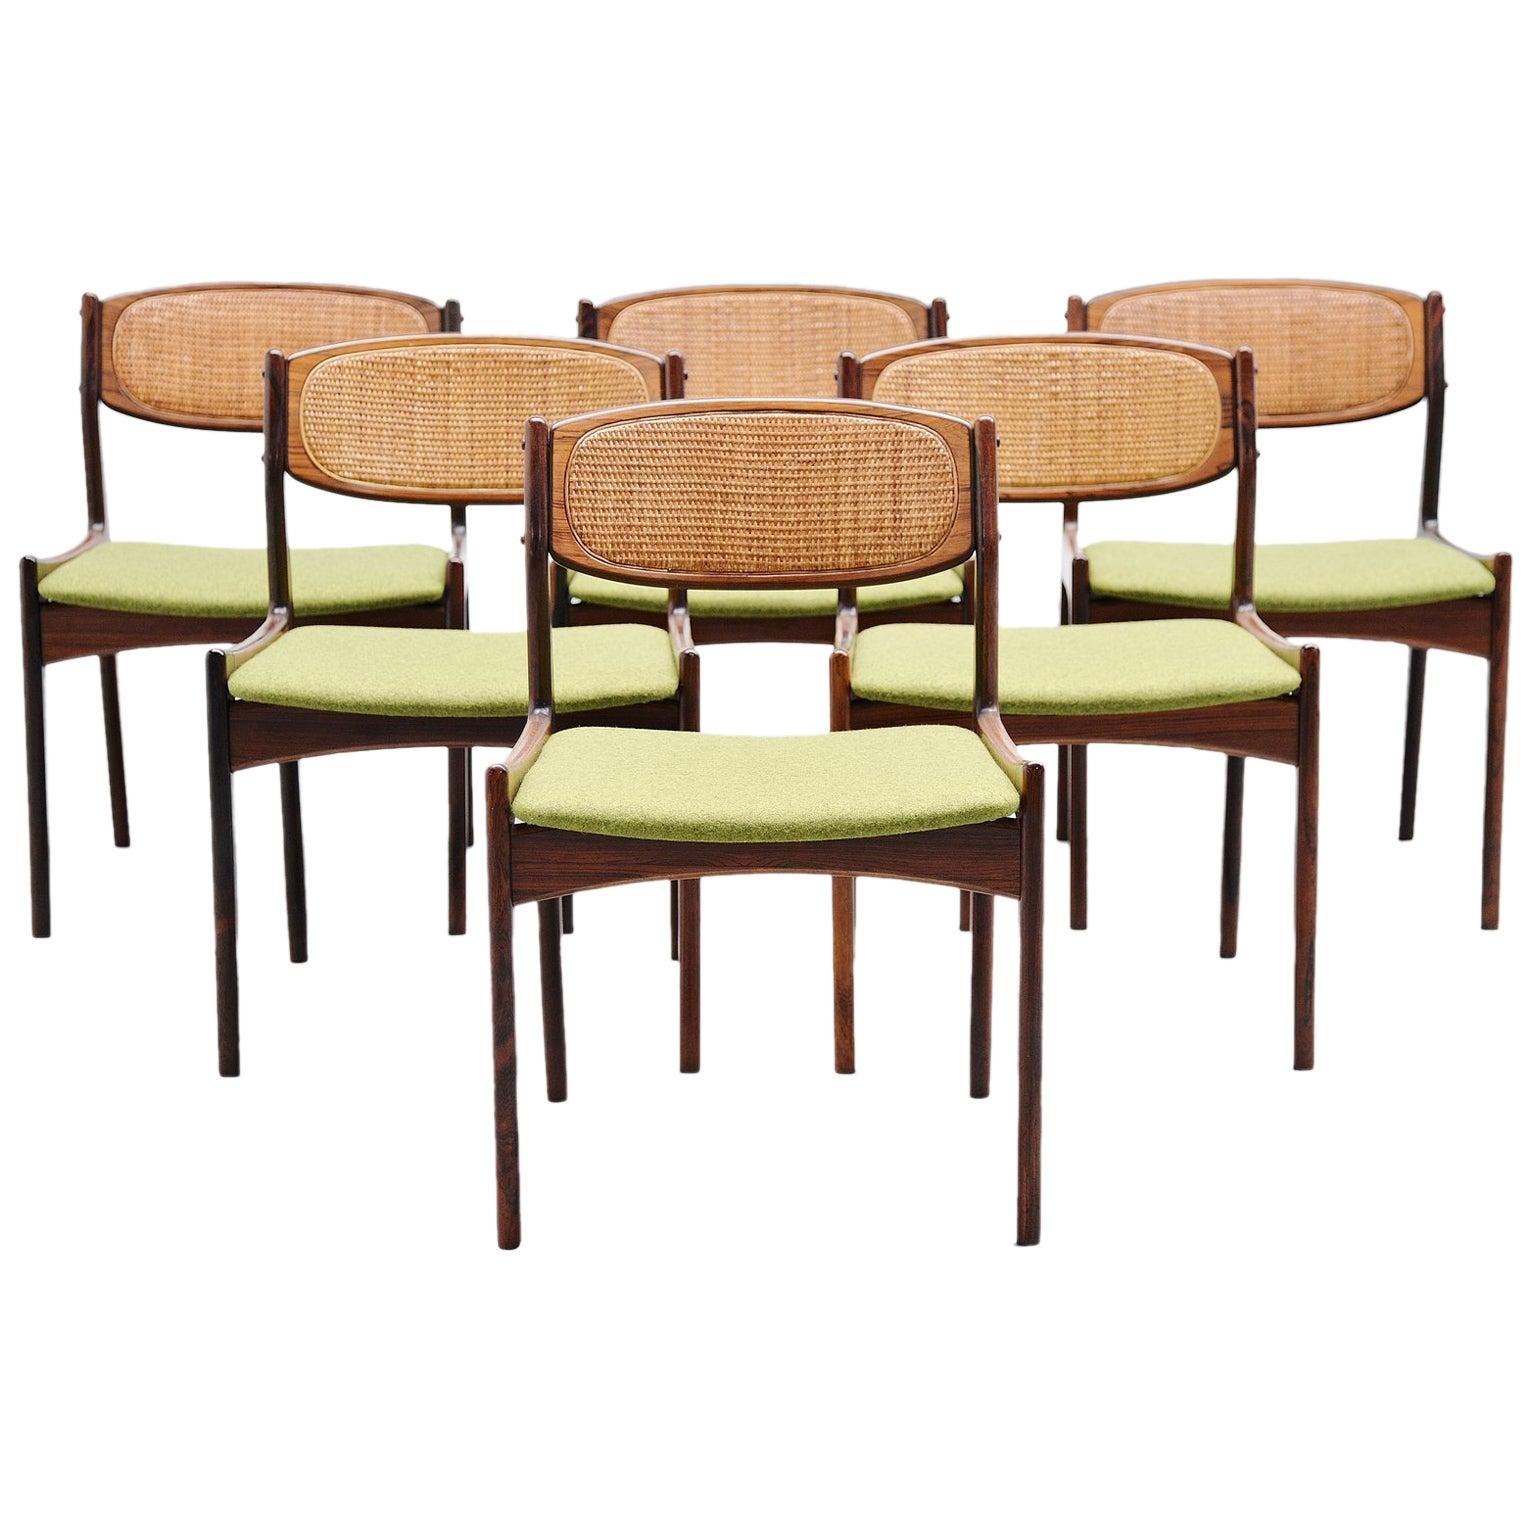 Ib Kofod Larsen Chairs by Christian Linneberg Denmark, 1960